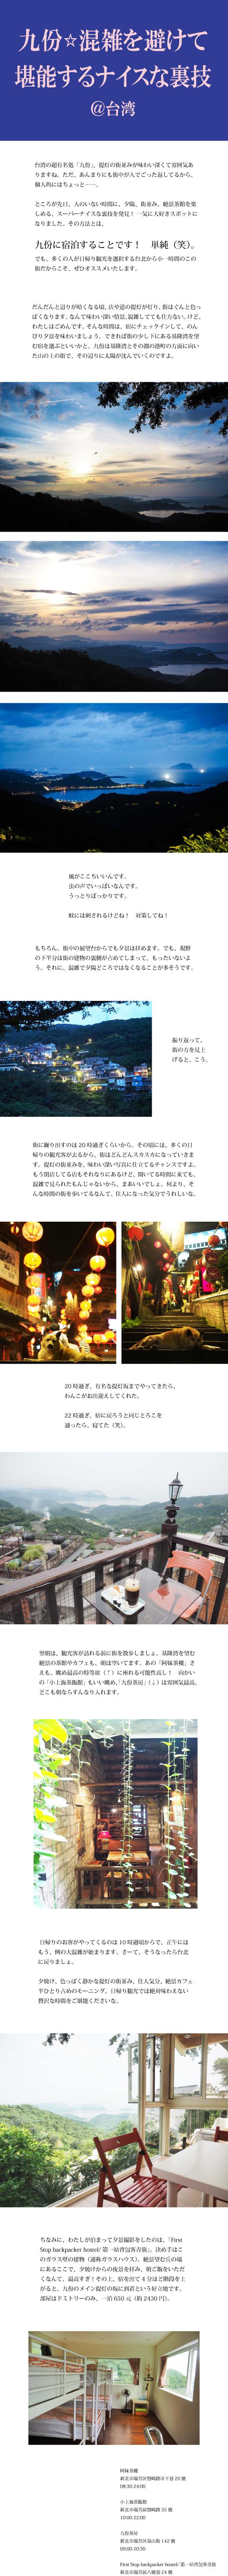 tomako170712.jpg